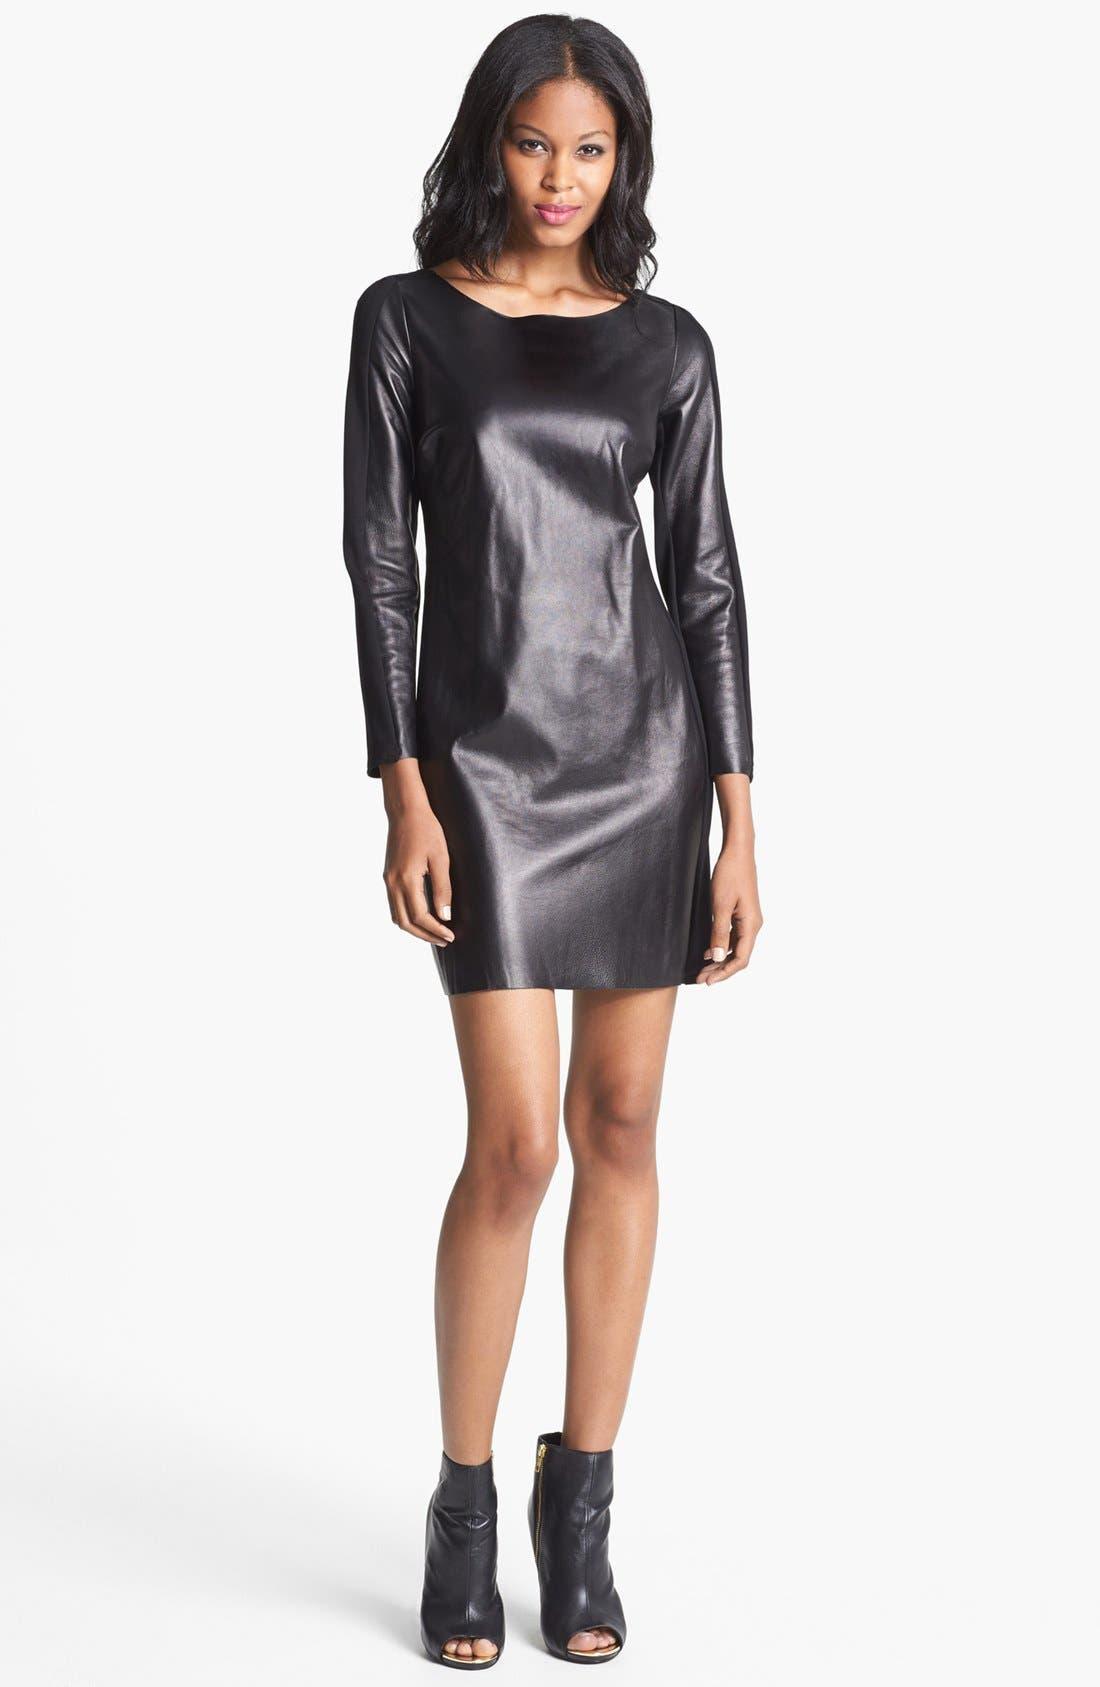 Alternate Image 1 Selected - ALICE & TRIXIE 'Lourdes' Leather & Ponte Knit Dress